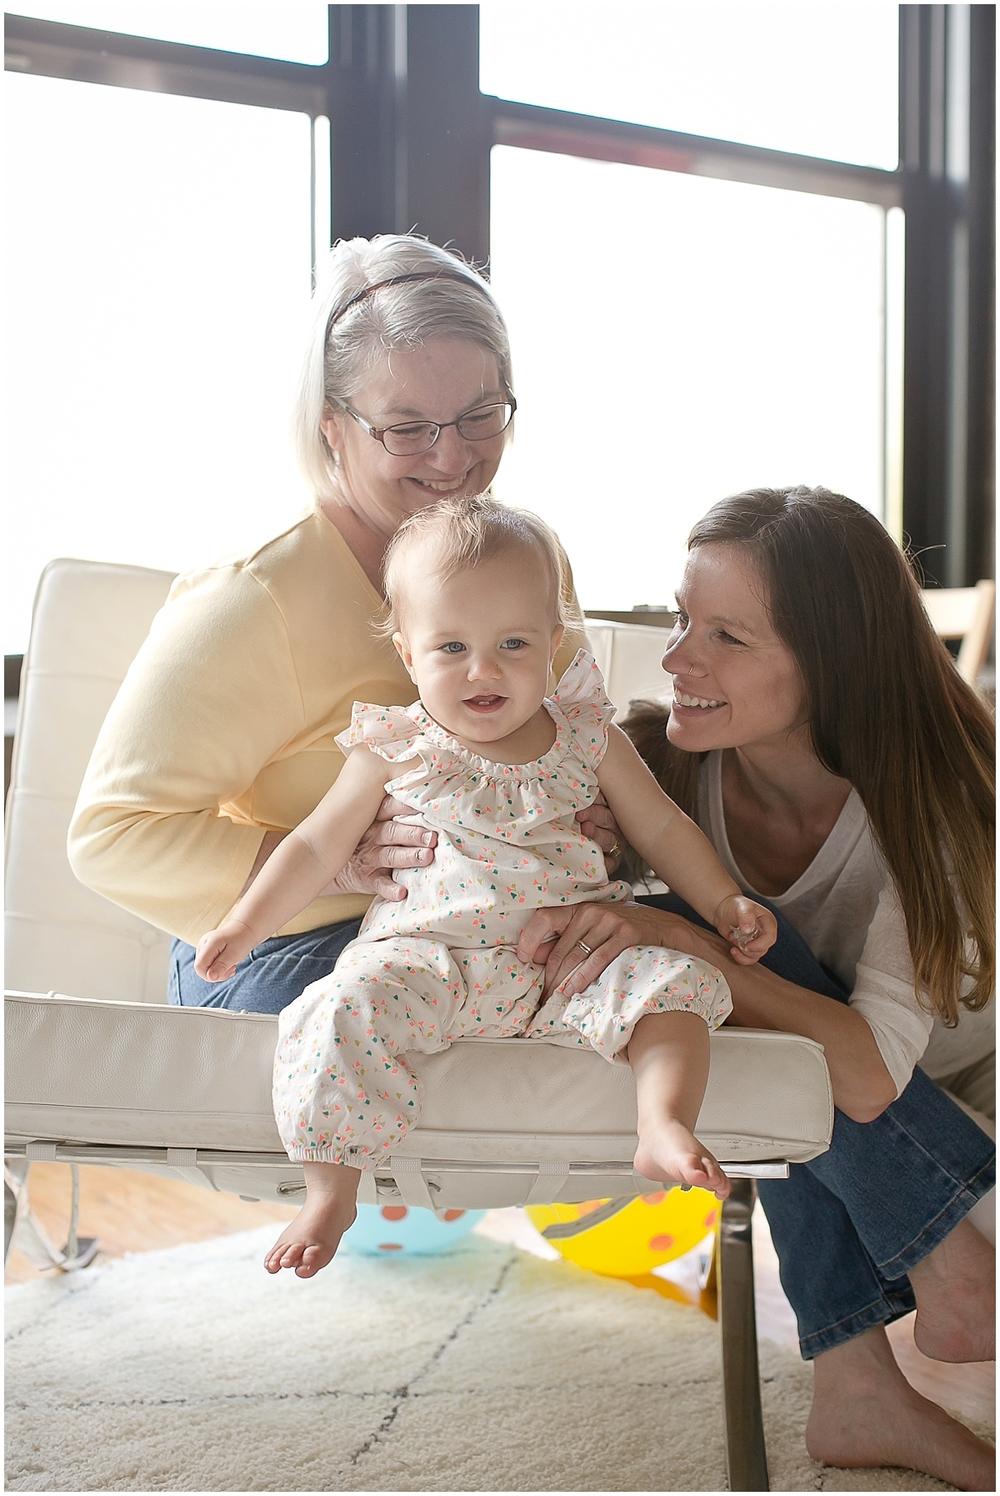 clickforhope | give back cancer story_0515.jpg